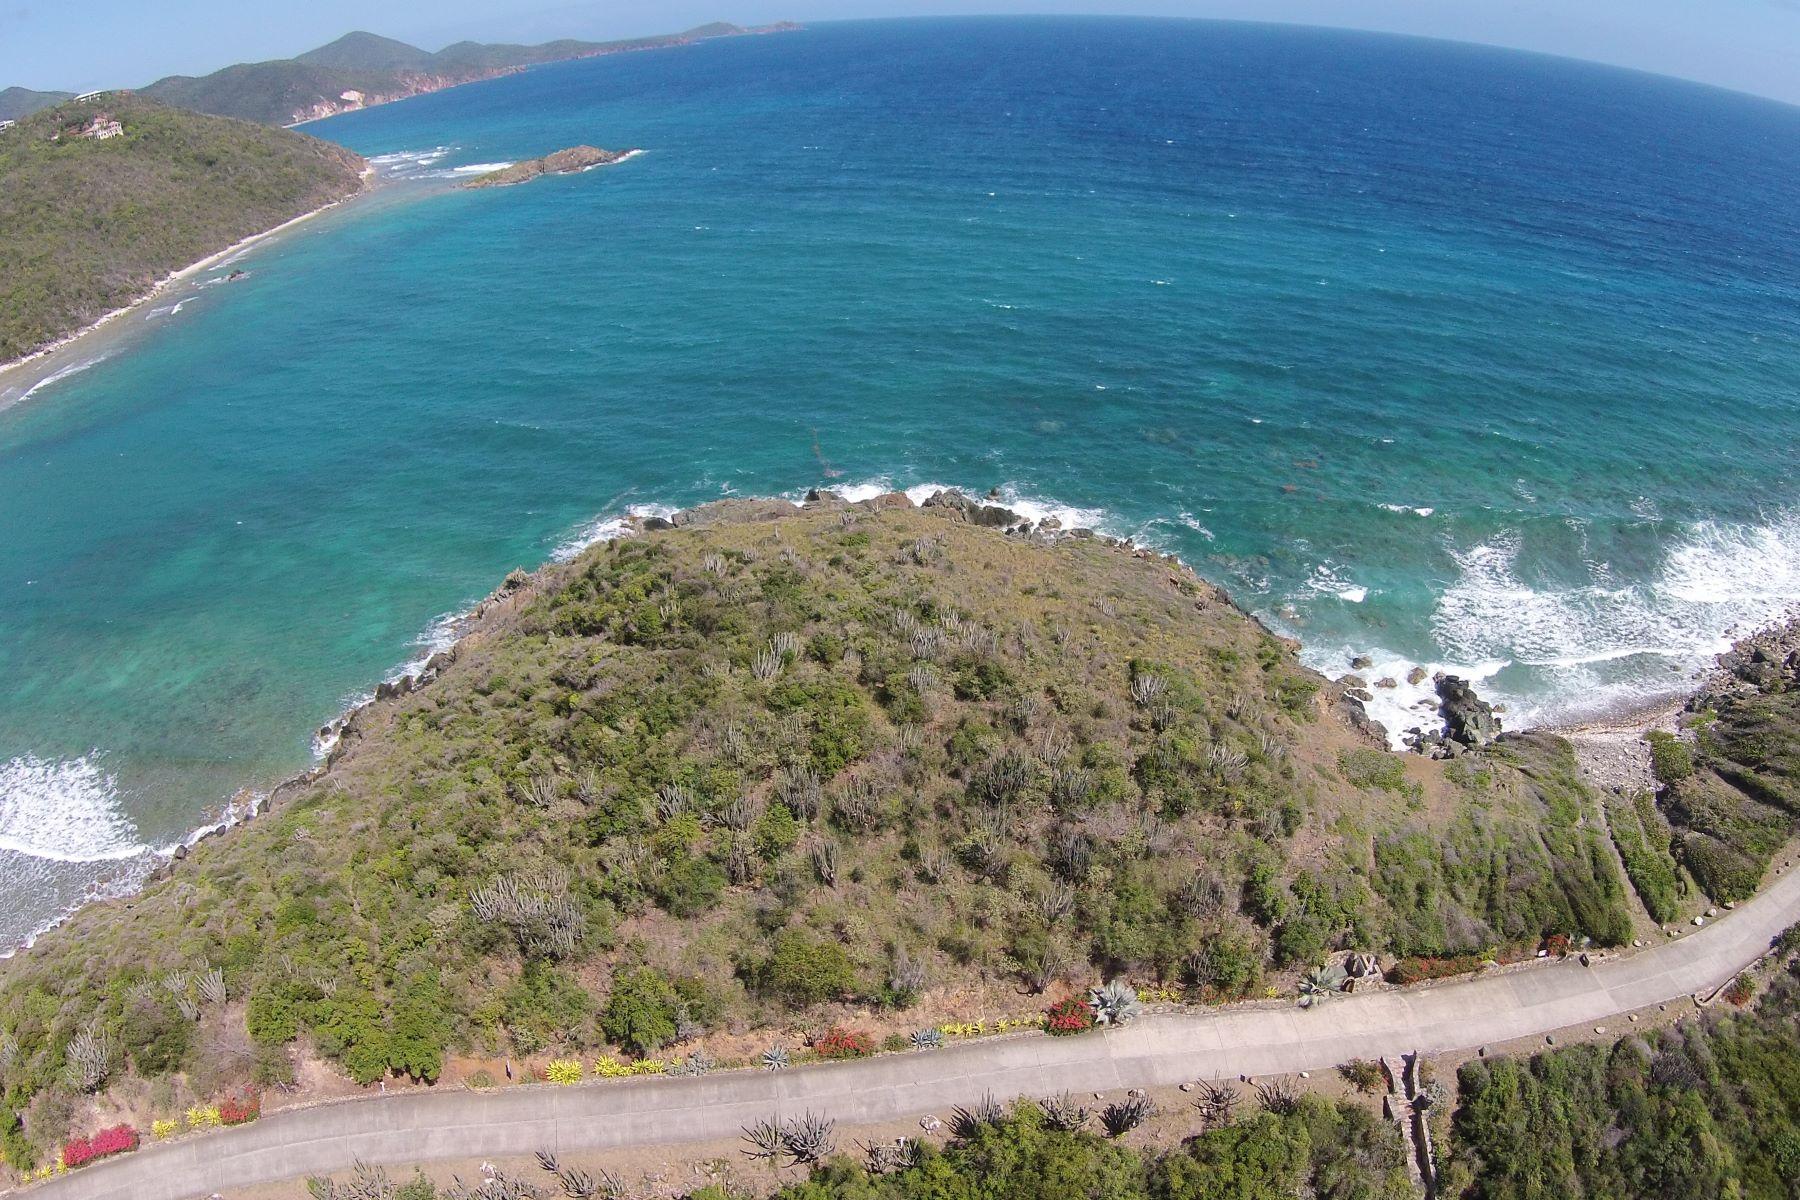 Land for Sale at 15A-10-3R Rendezvous & Ditleff St John, Virgin Islands 00830 United States Virgin Islands